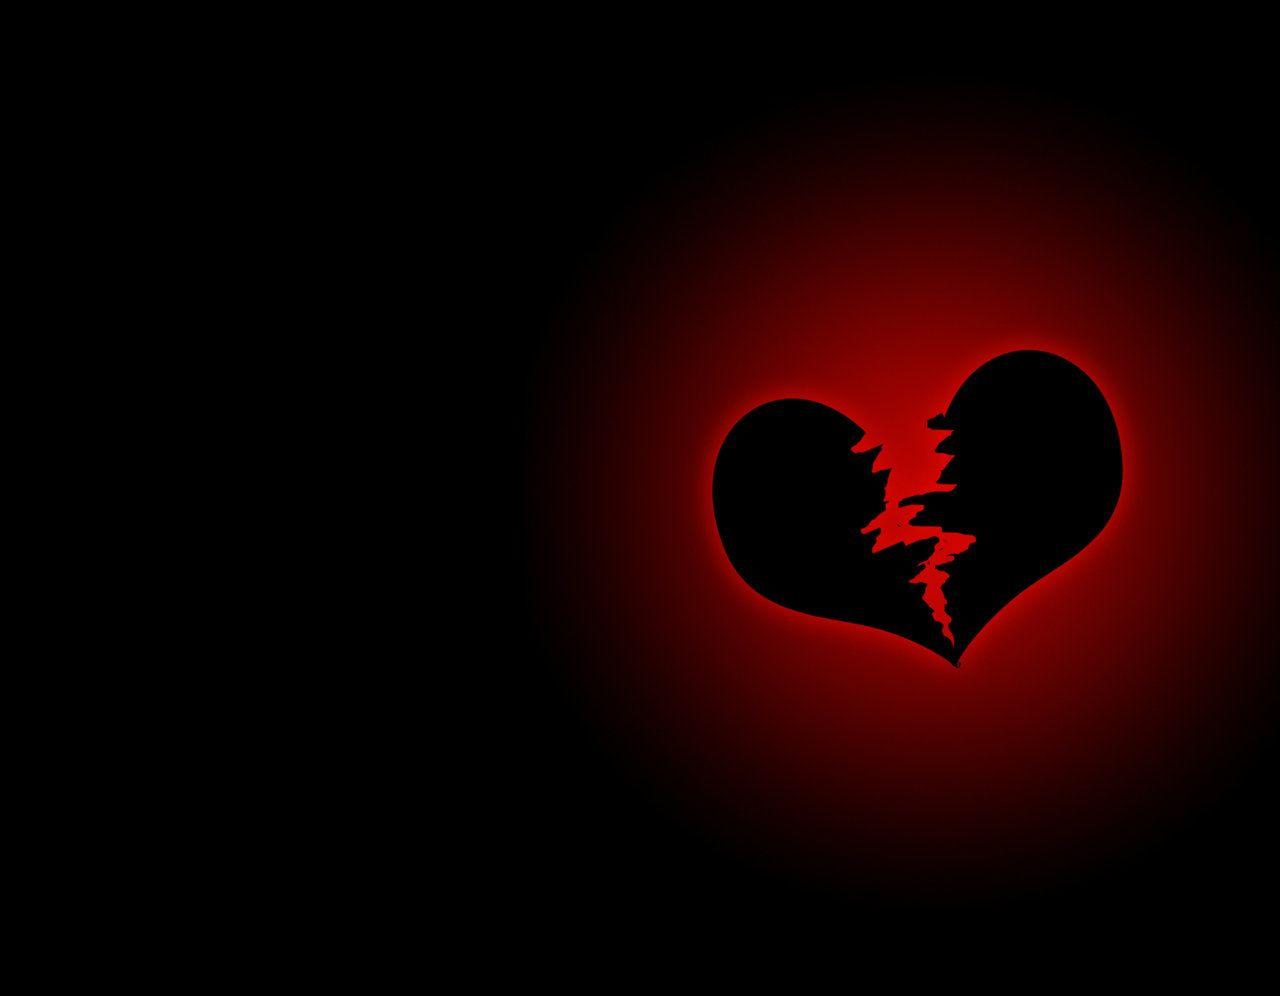 I Am Not Allowed To Love Rosalie Even When My Heart Longs For Her Broken Heart Wallpaper Broken Heart Pictures Heart Wallpaper